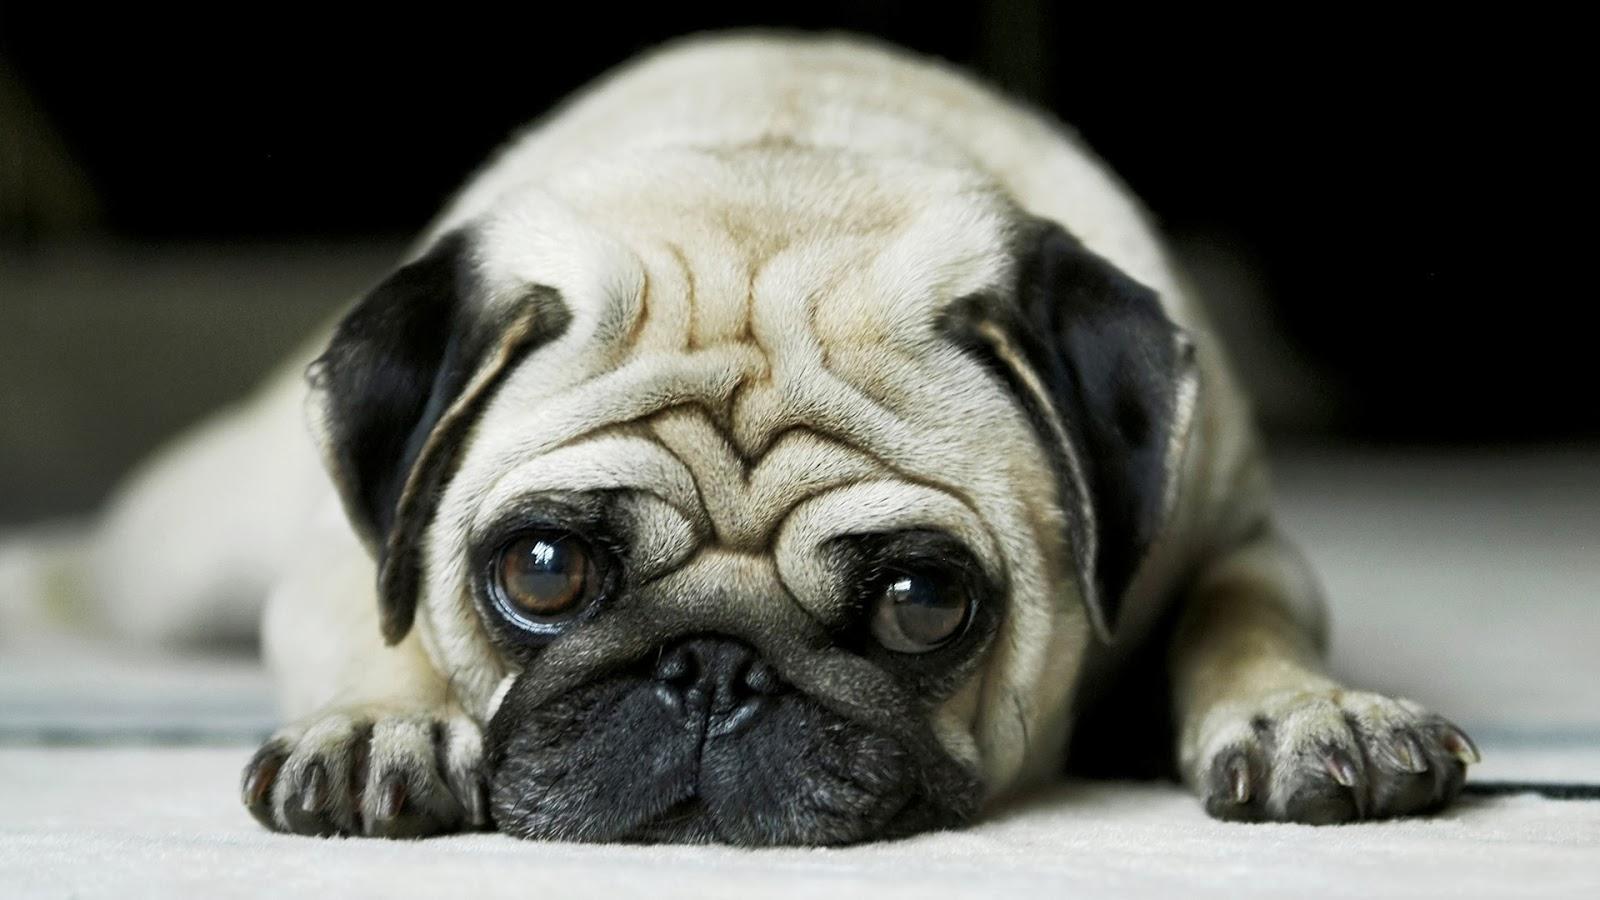 "<img src=""http://4.bp.blogspot.com/-7zy_MXp27I8/UukntNzPEKI/AAAAAAAAKng/grcTS2W2lmU/s1600/pug-wallpaper.jpg"" alt=""pug wallpaper"" />"